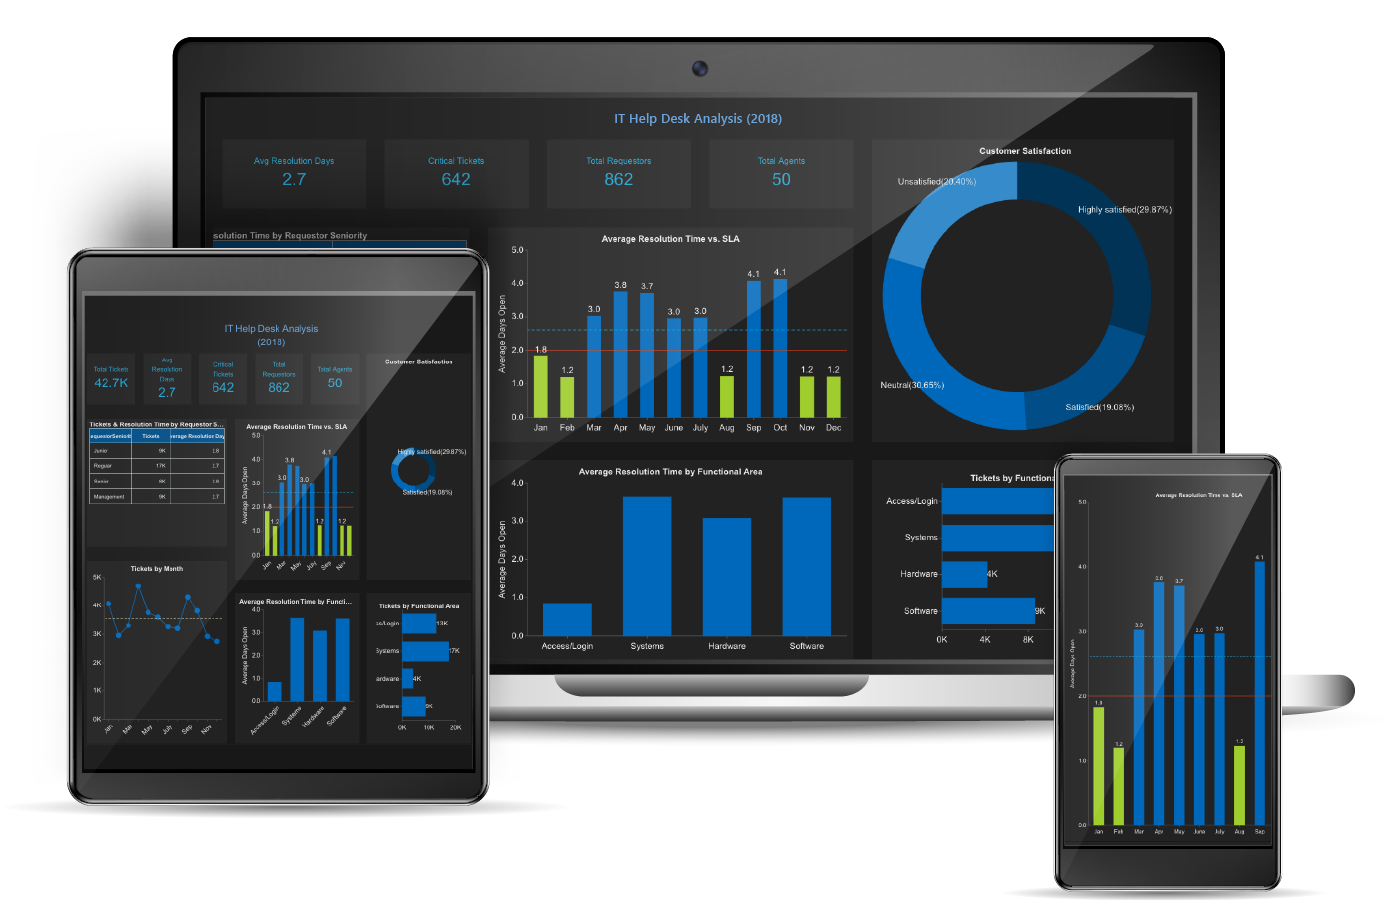 Business Intelligence Embedded BI - IT Helpdesk Dashboard